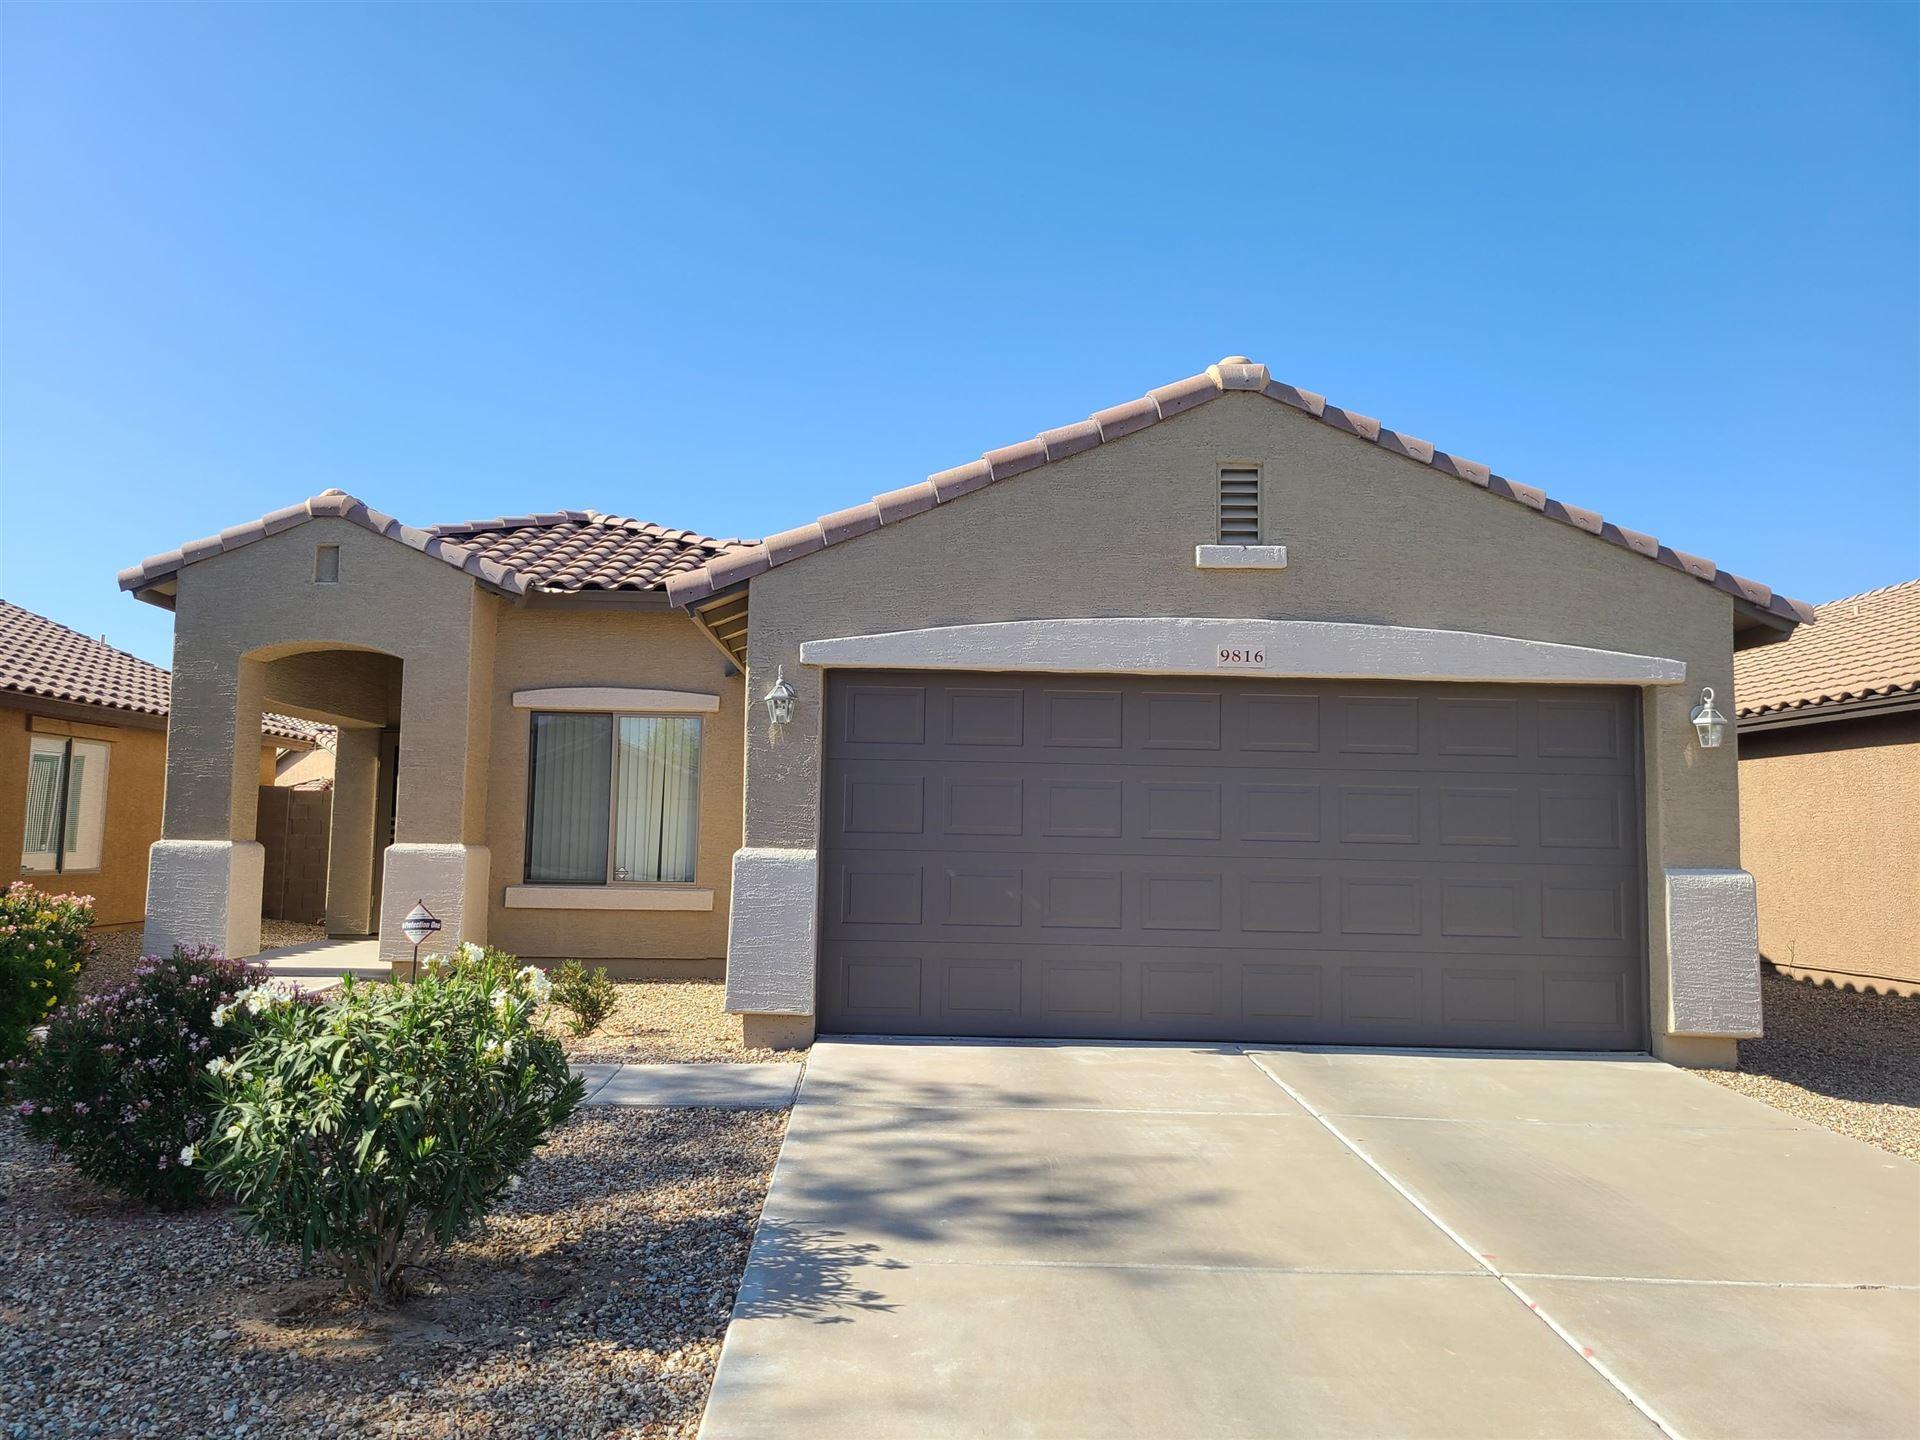 9816 W HEBER Road, Tolleson, AZ 85353 - MLS#: 6235738